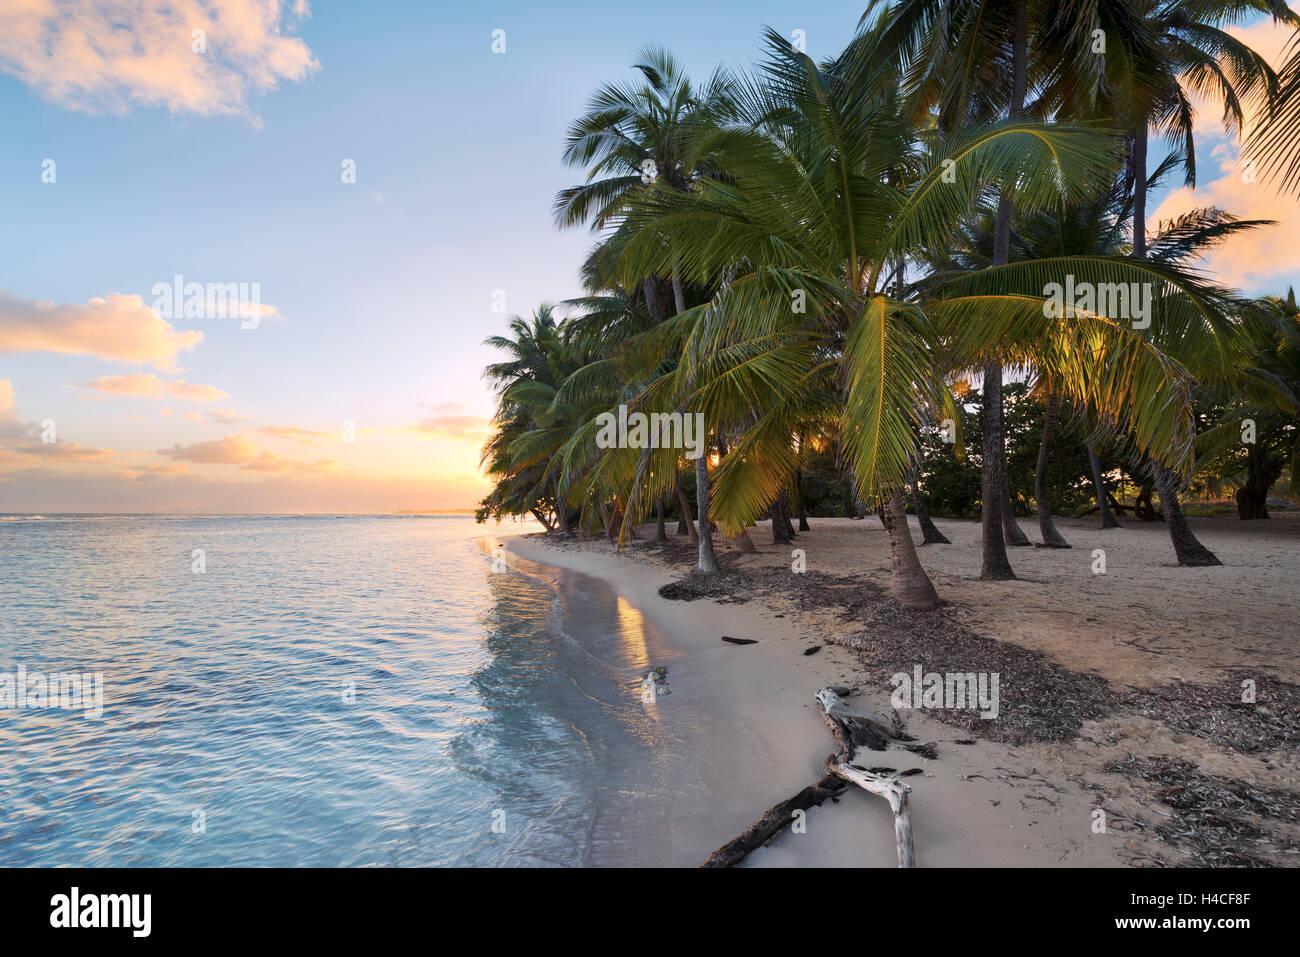 Guadeloupe Karibik Frankreich Insel Tropisch Paradies Palmen